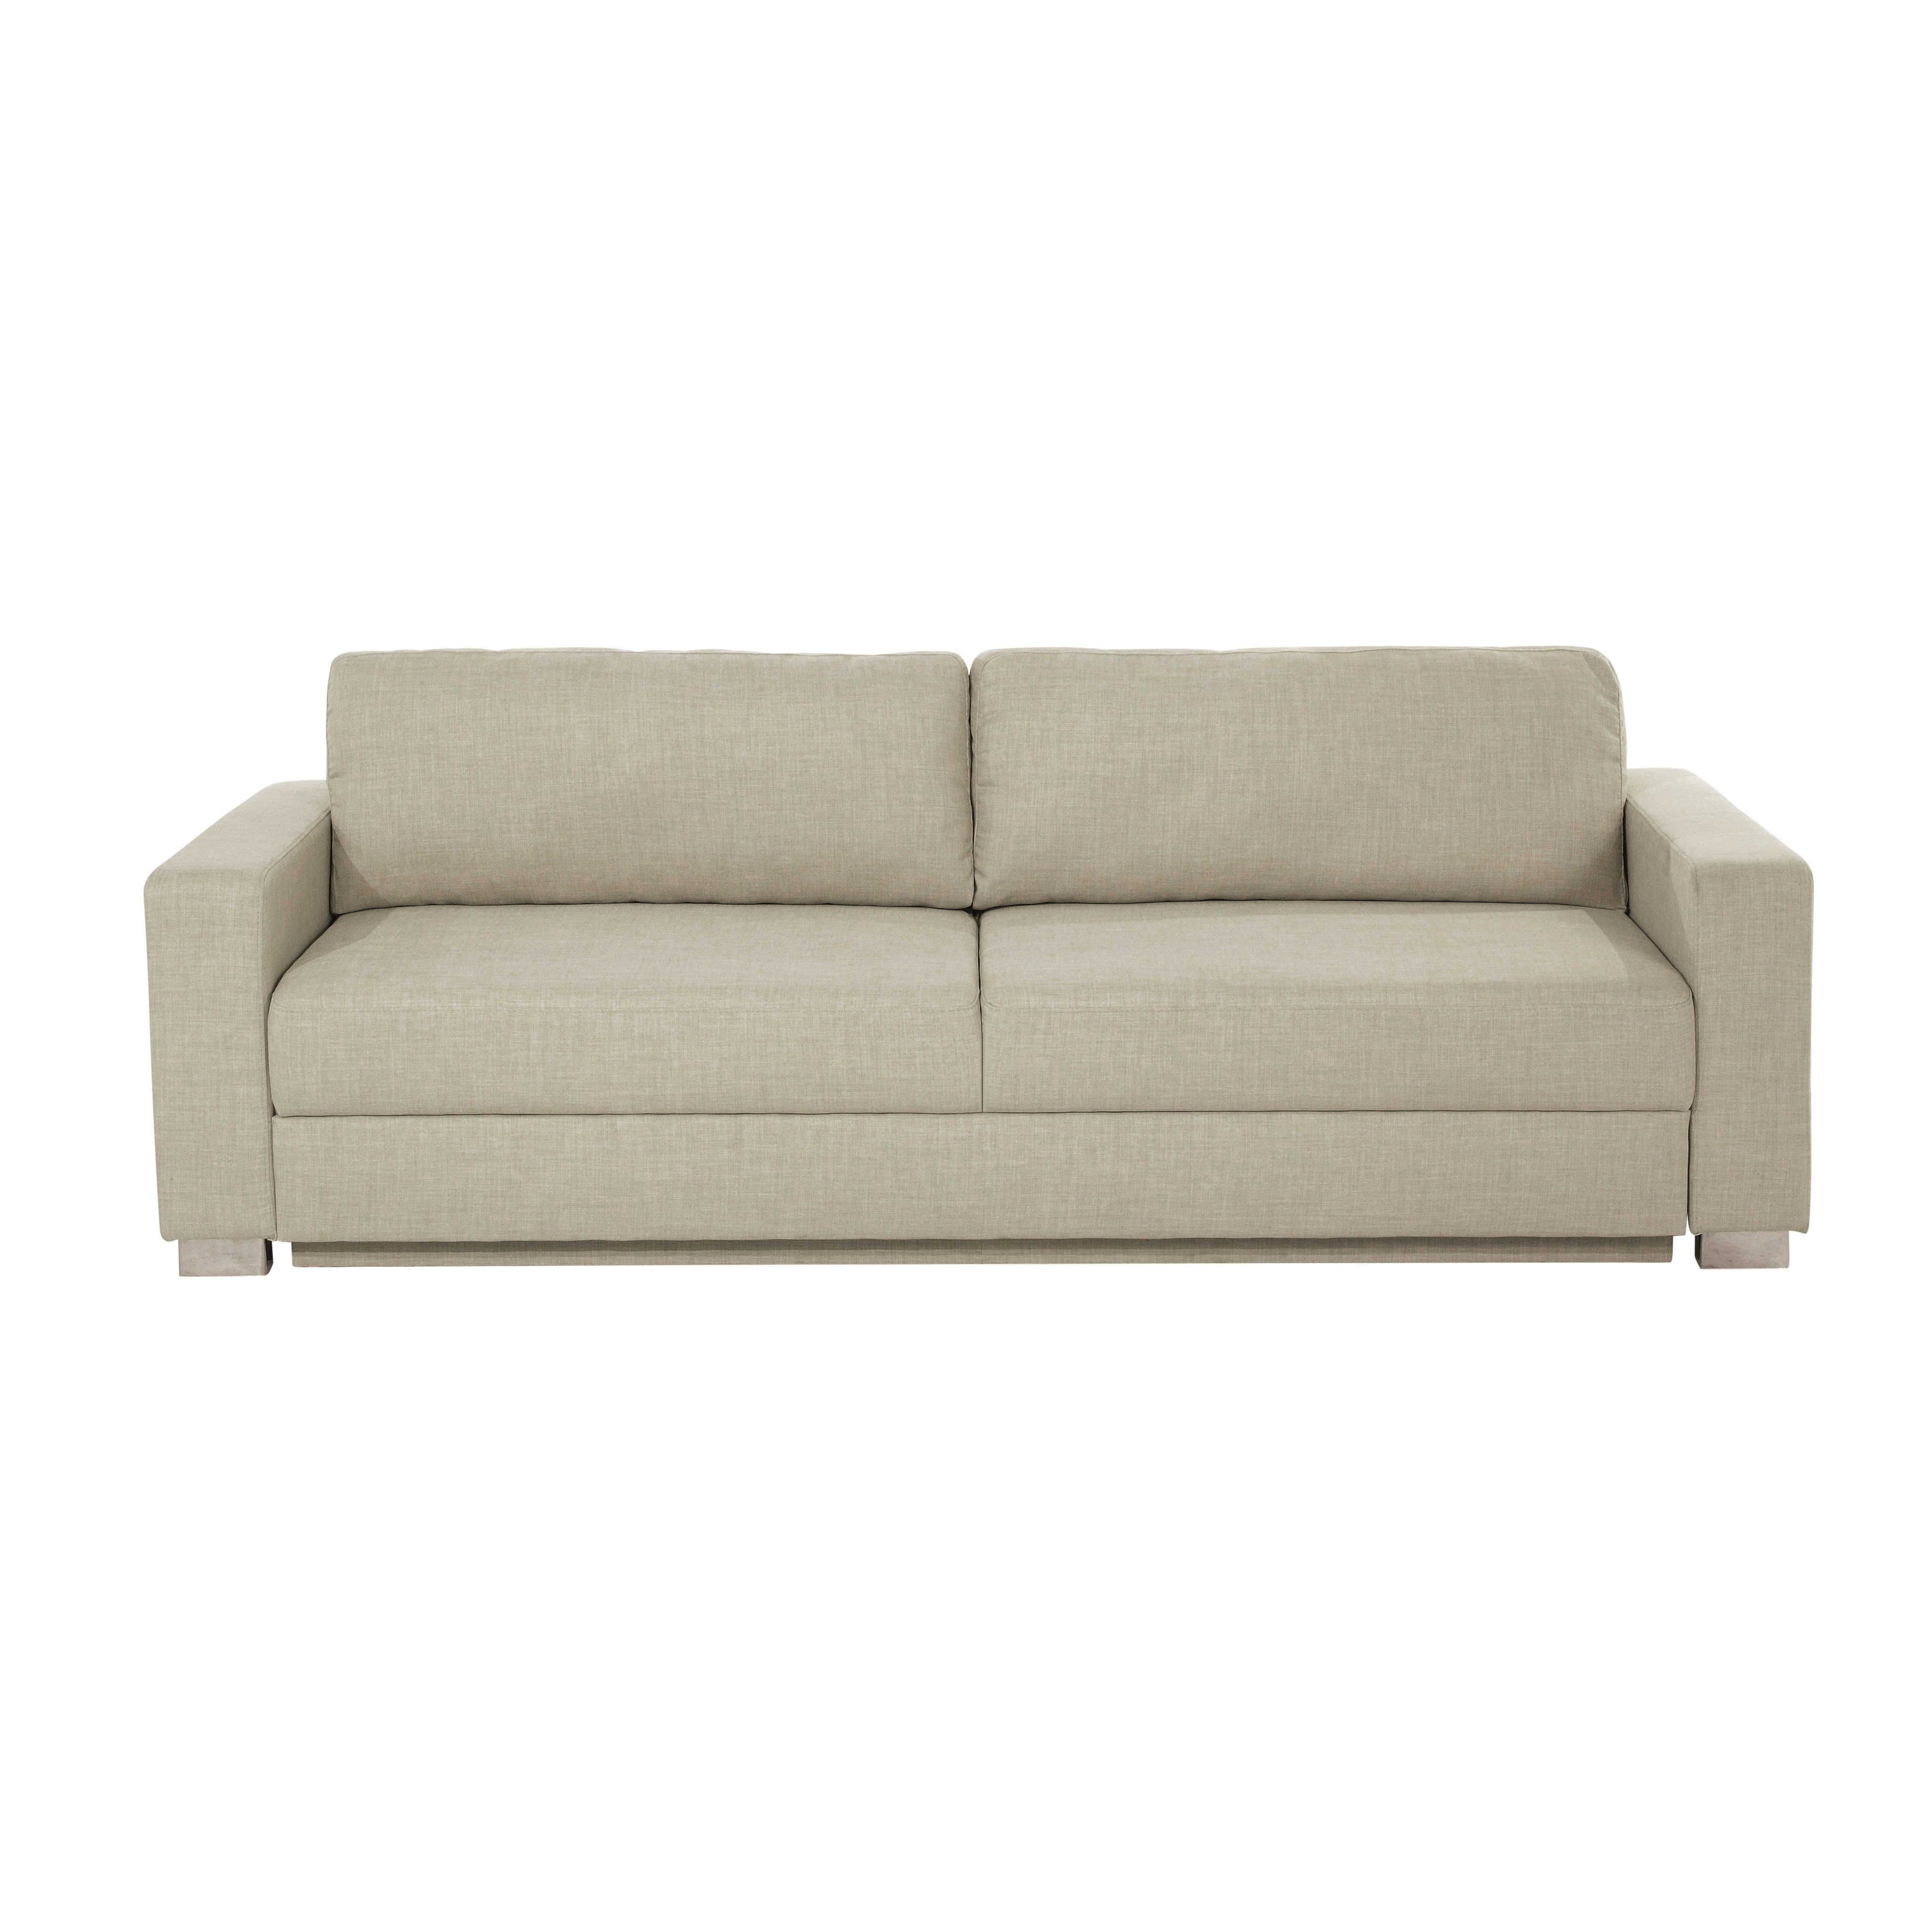 Canapés Droits | Sofa, Beige, Convertible intérieur Canape Beige Convertible